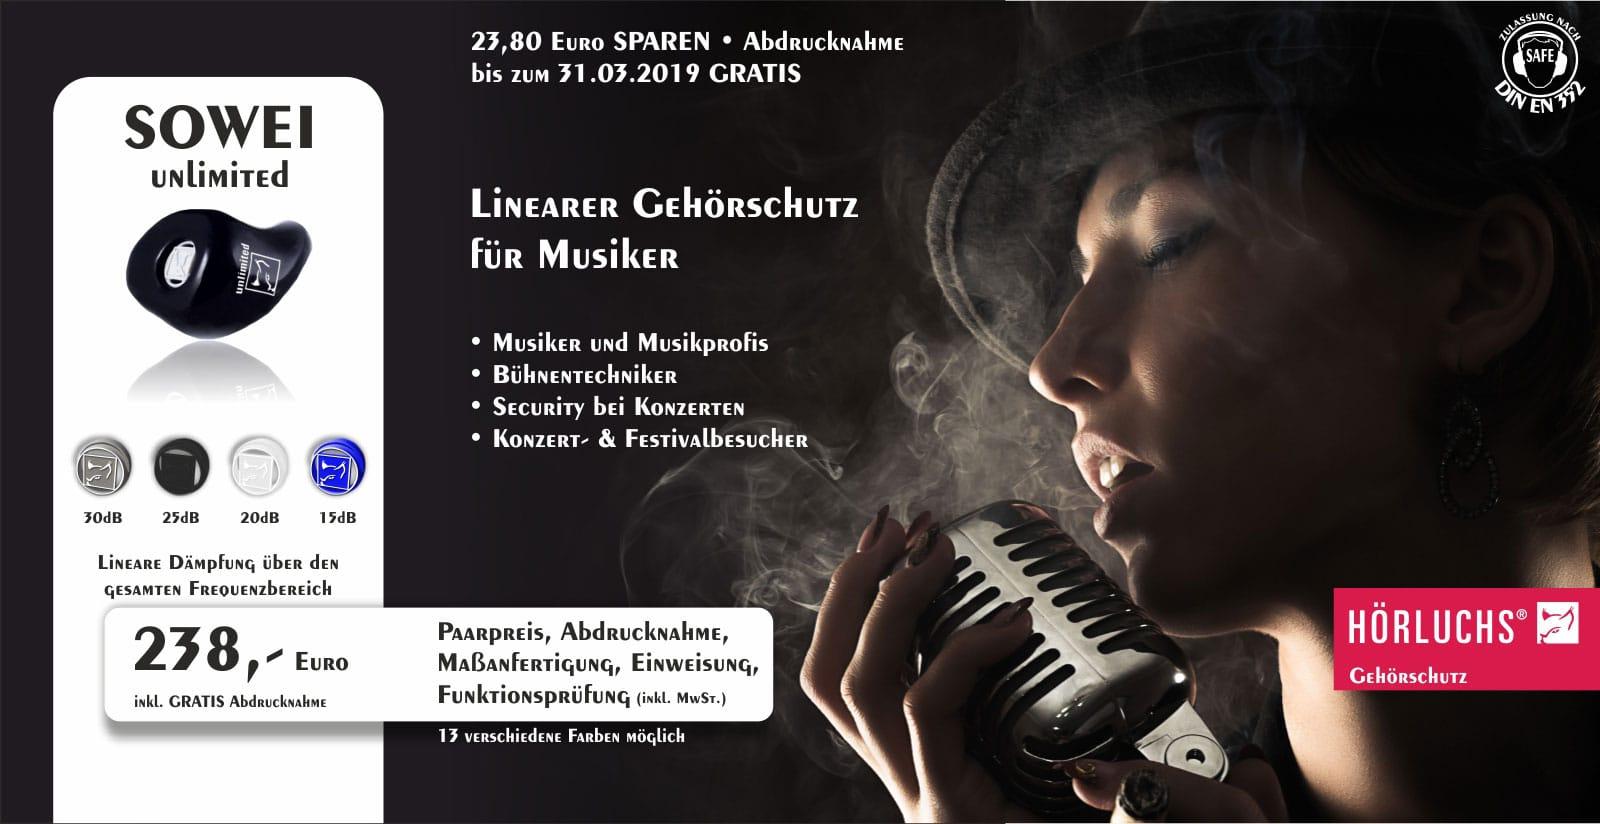 Gisbrecht Hörakustik - Gehörschutz Partner Hörluchs - SOWEI Unlimited Aktion